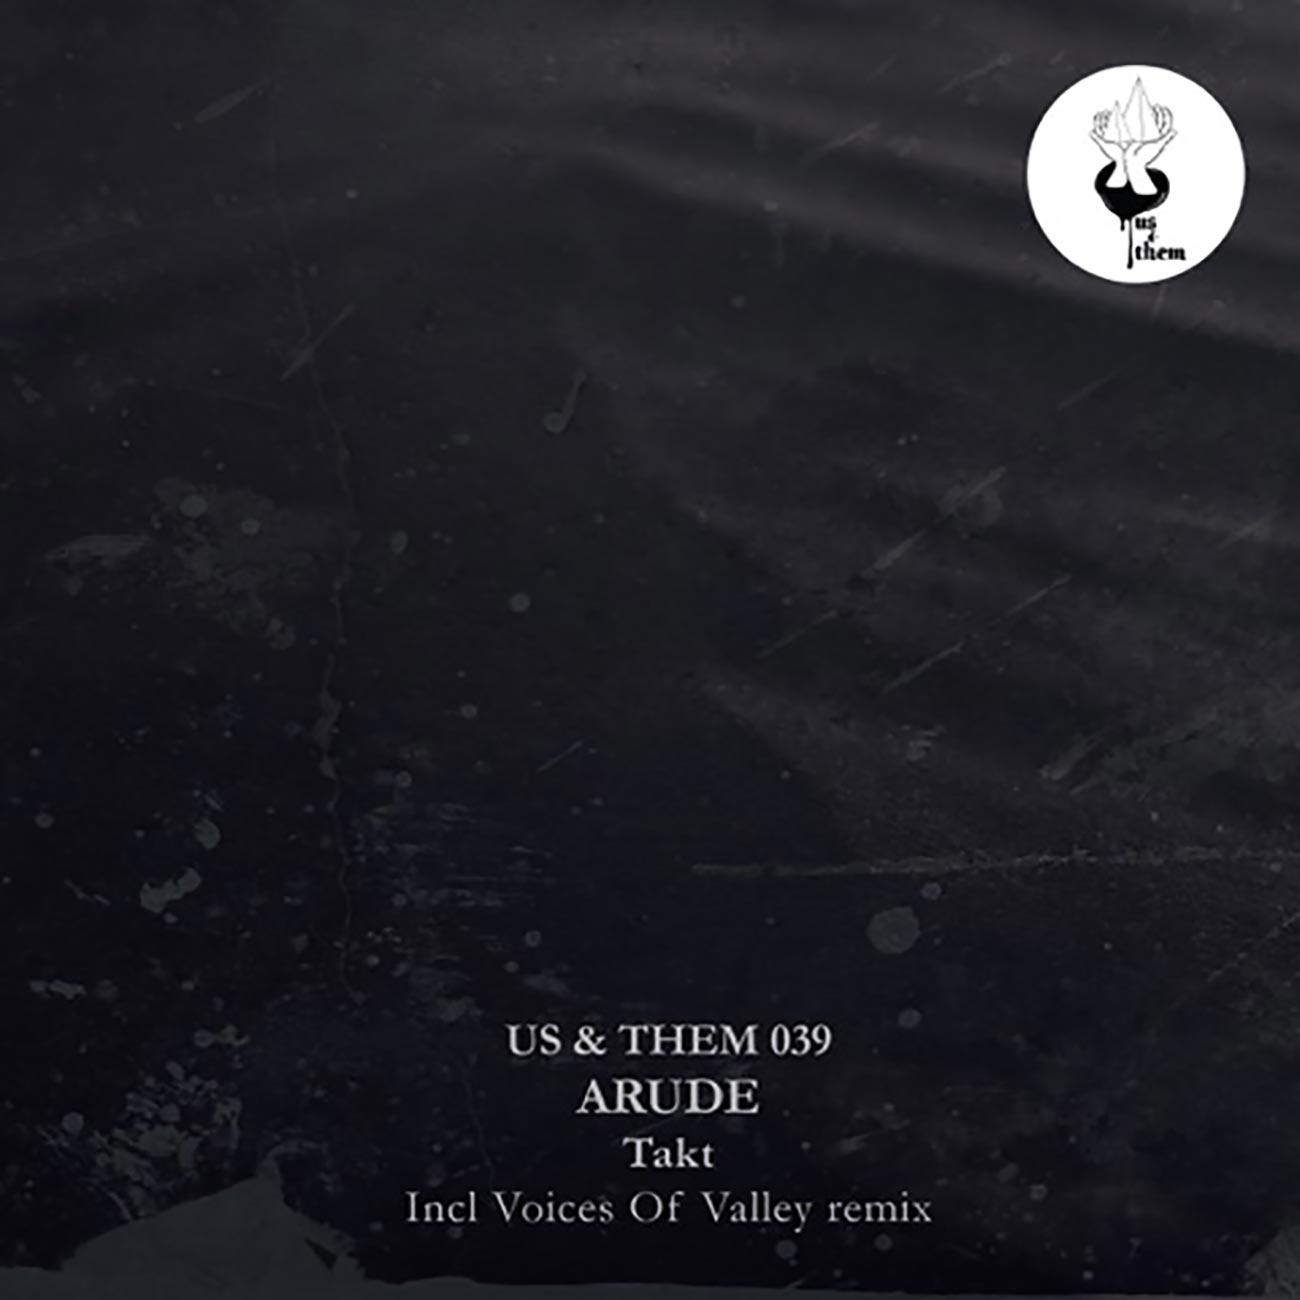 Arude-Takt-EP